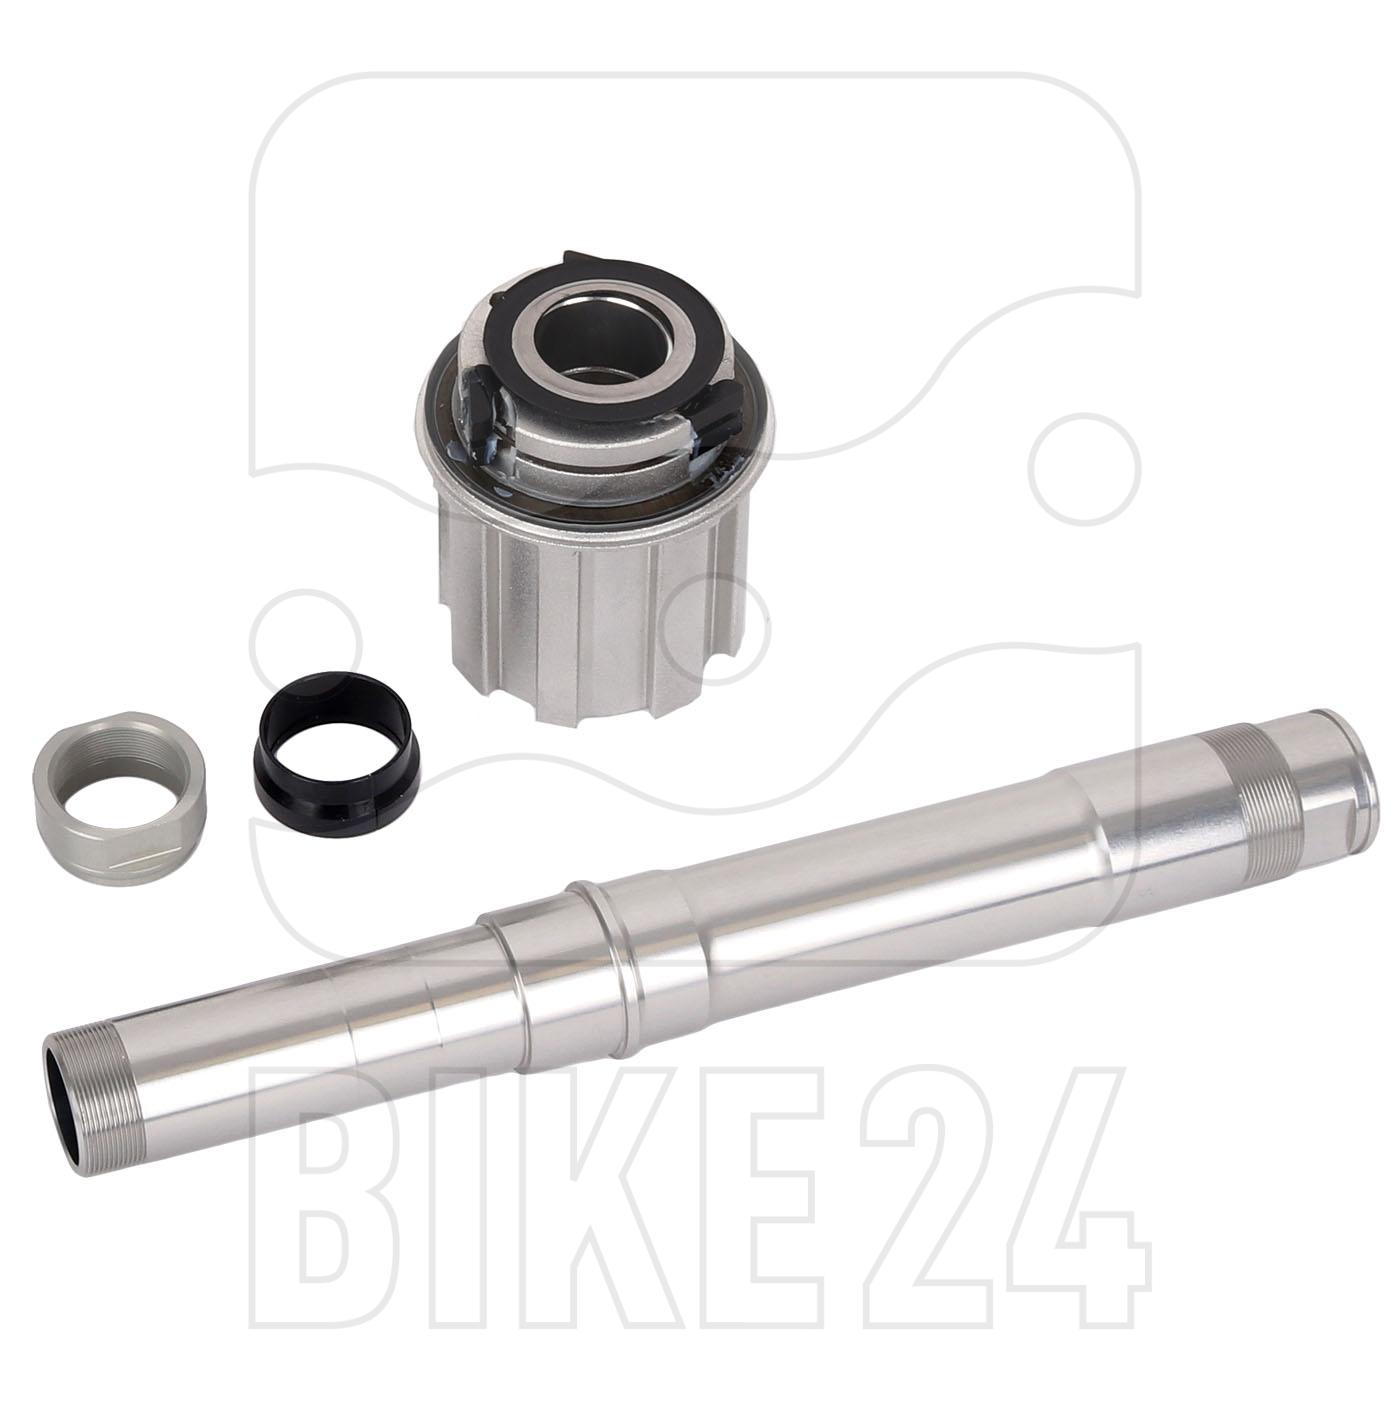 Campagnolo N3W RetroFit Kit for Industrial Bearings